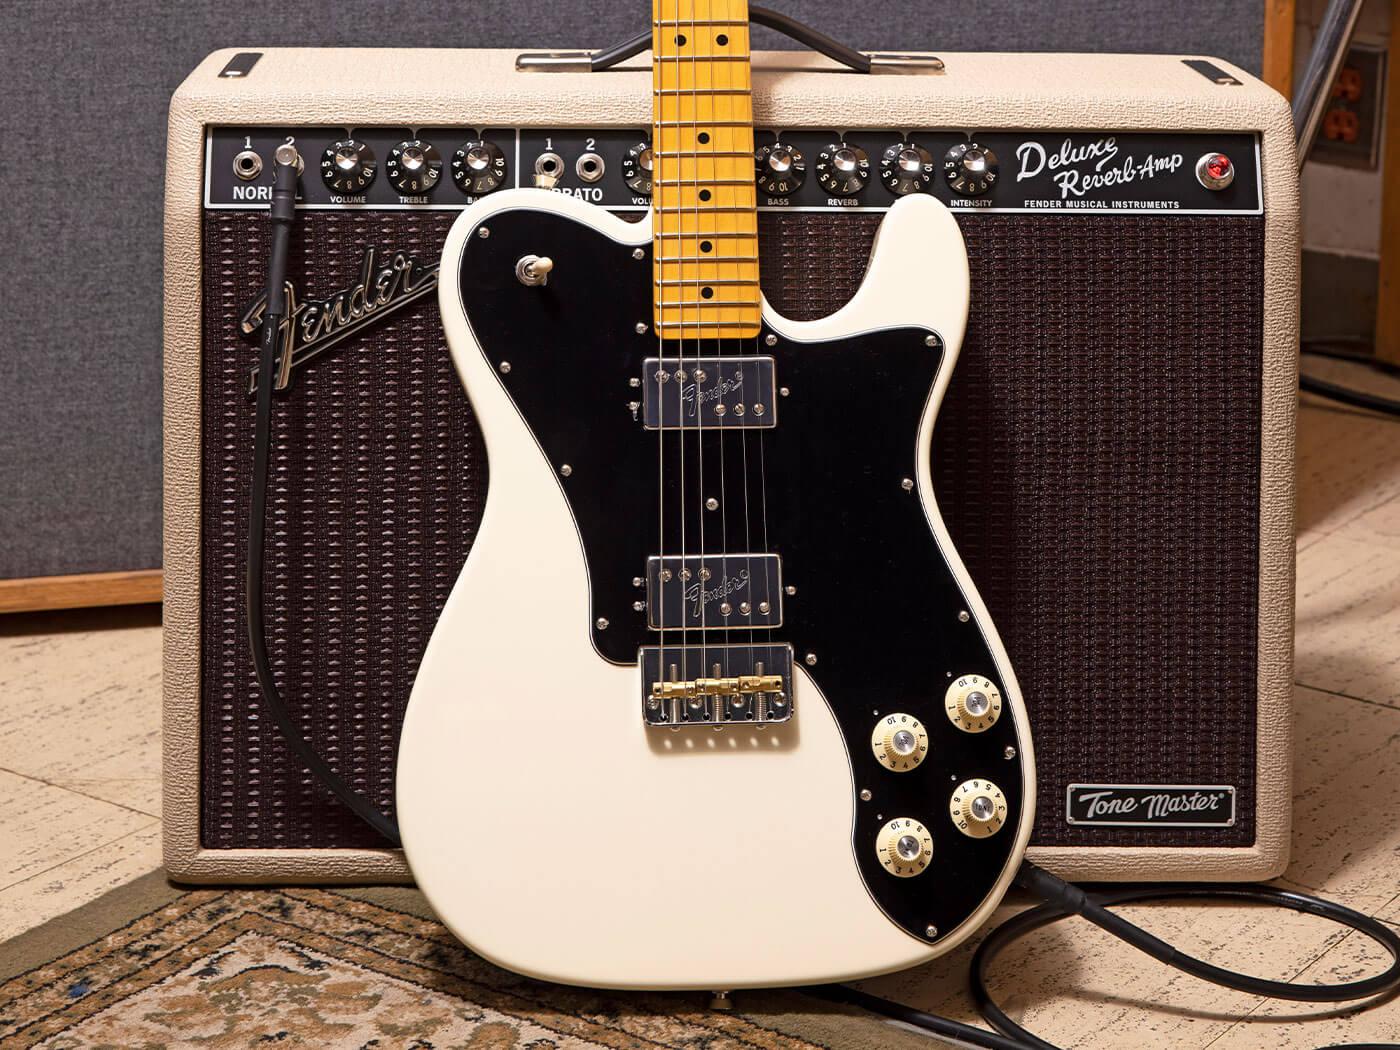 Fender American Professional II Tele Deluxe